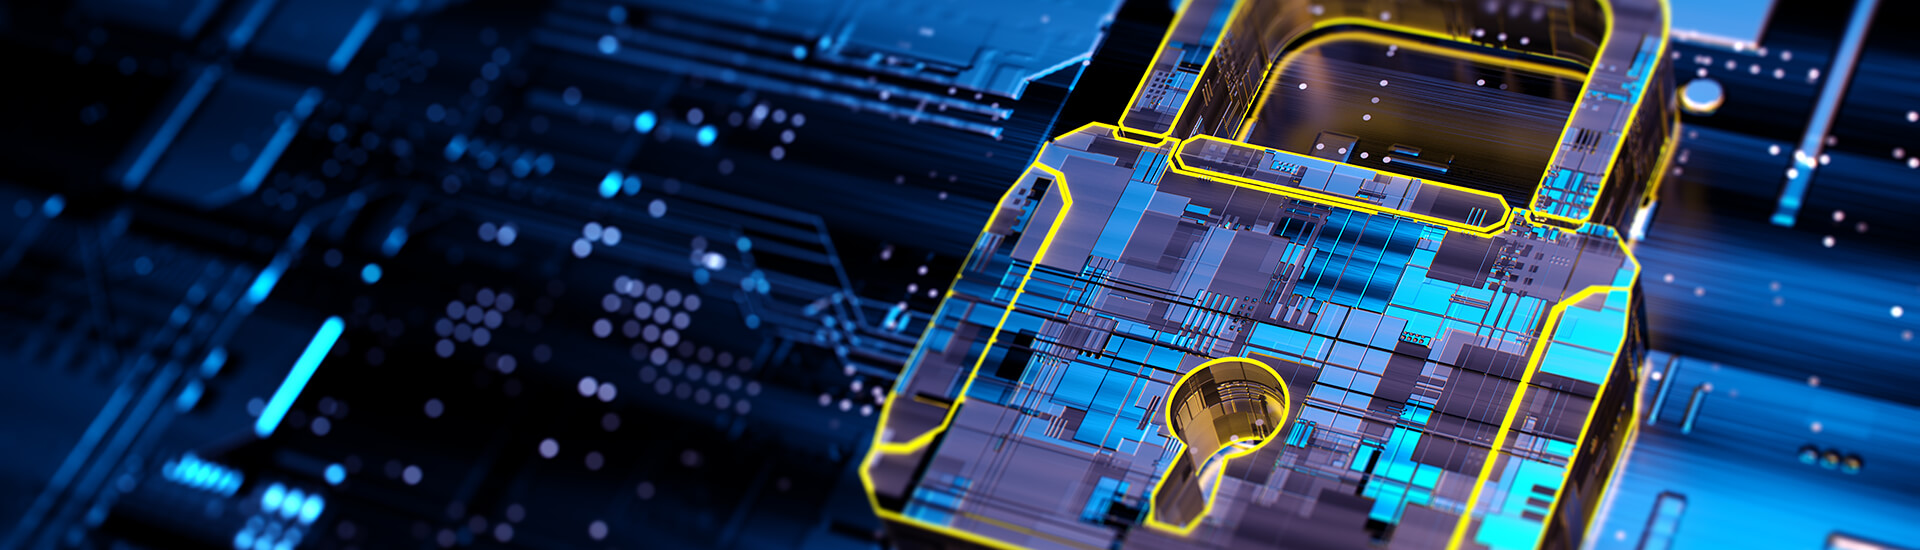 IT Service - Virus Protection - 1